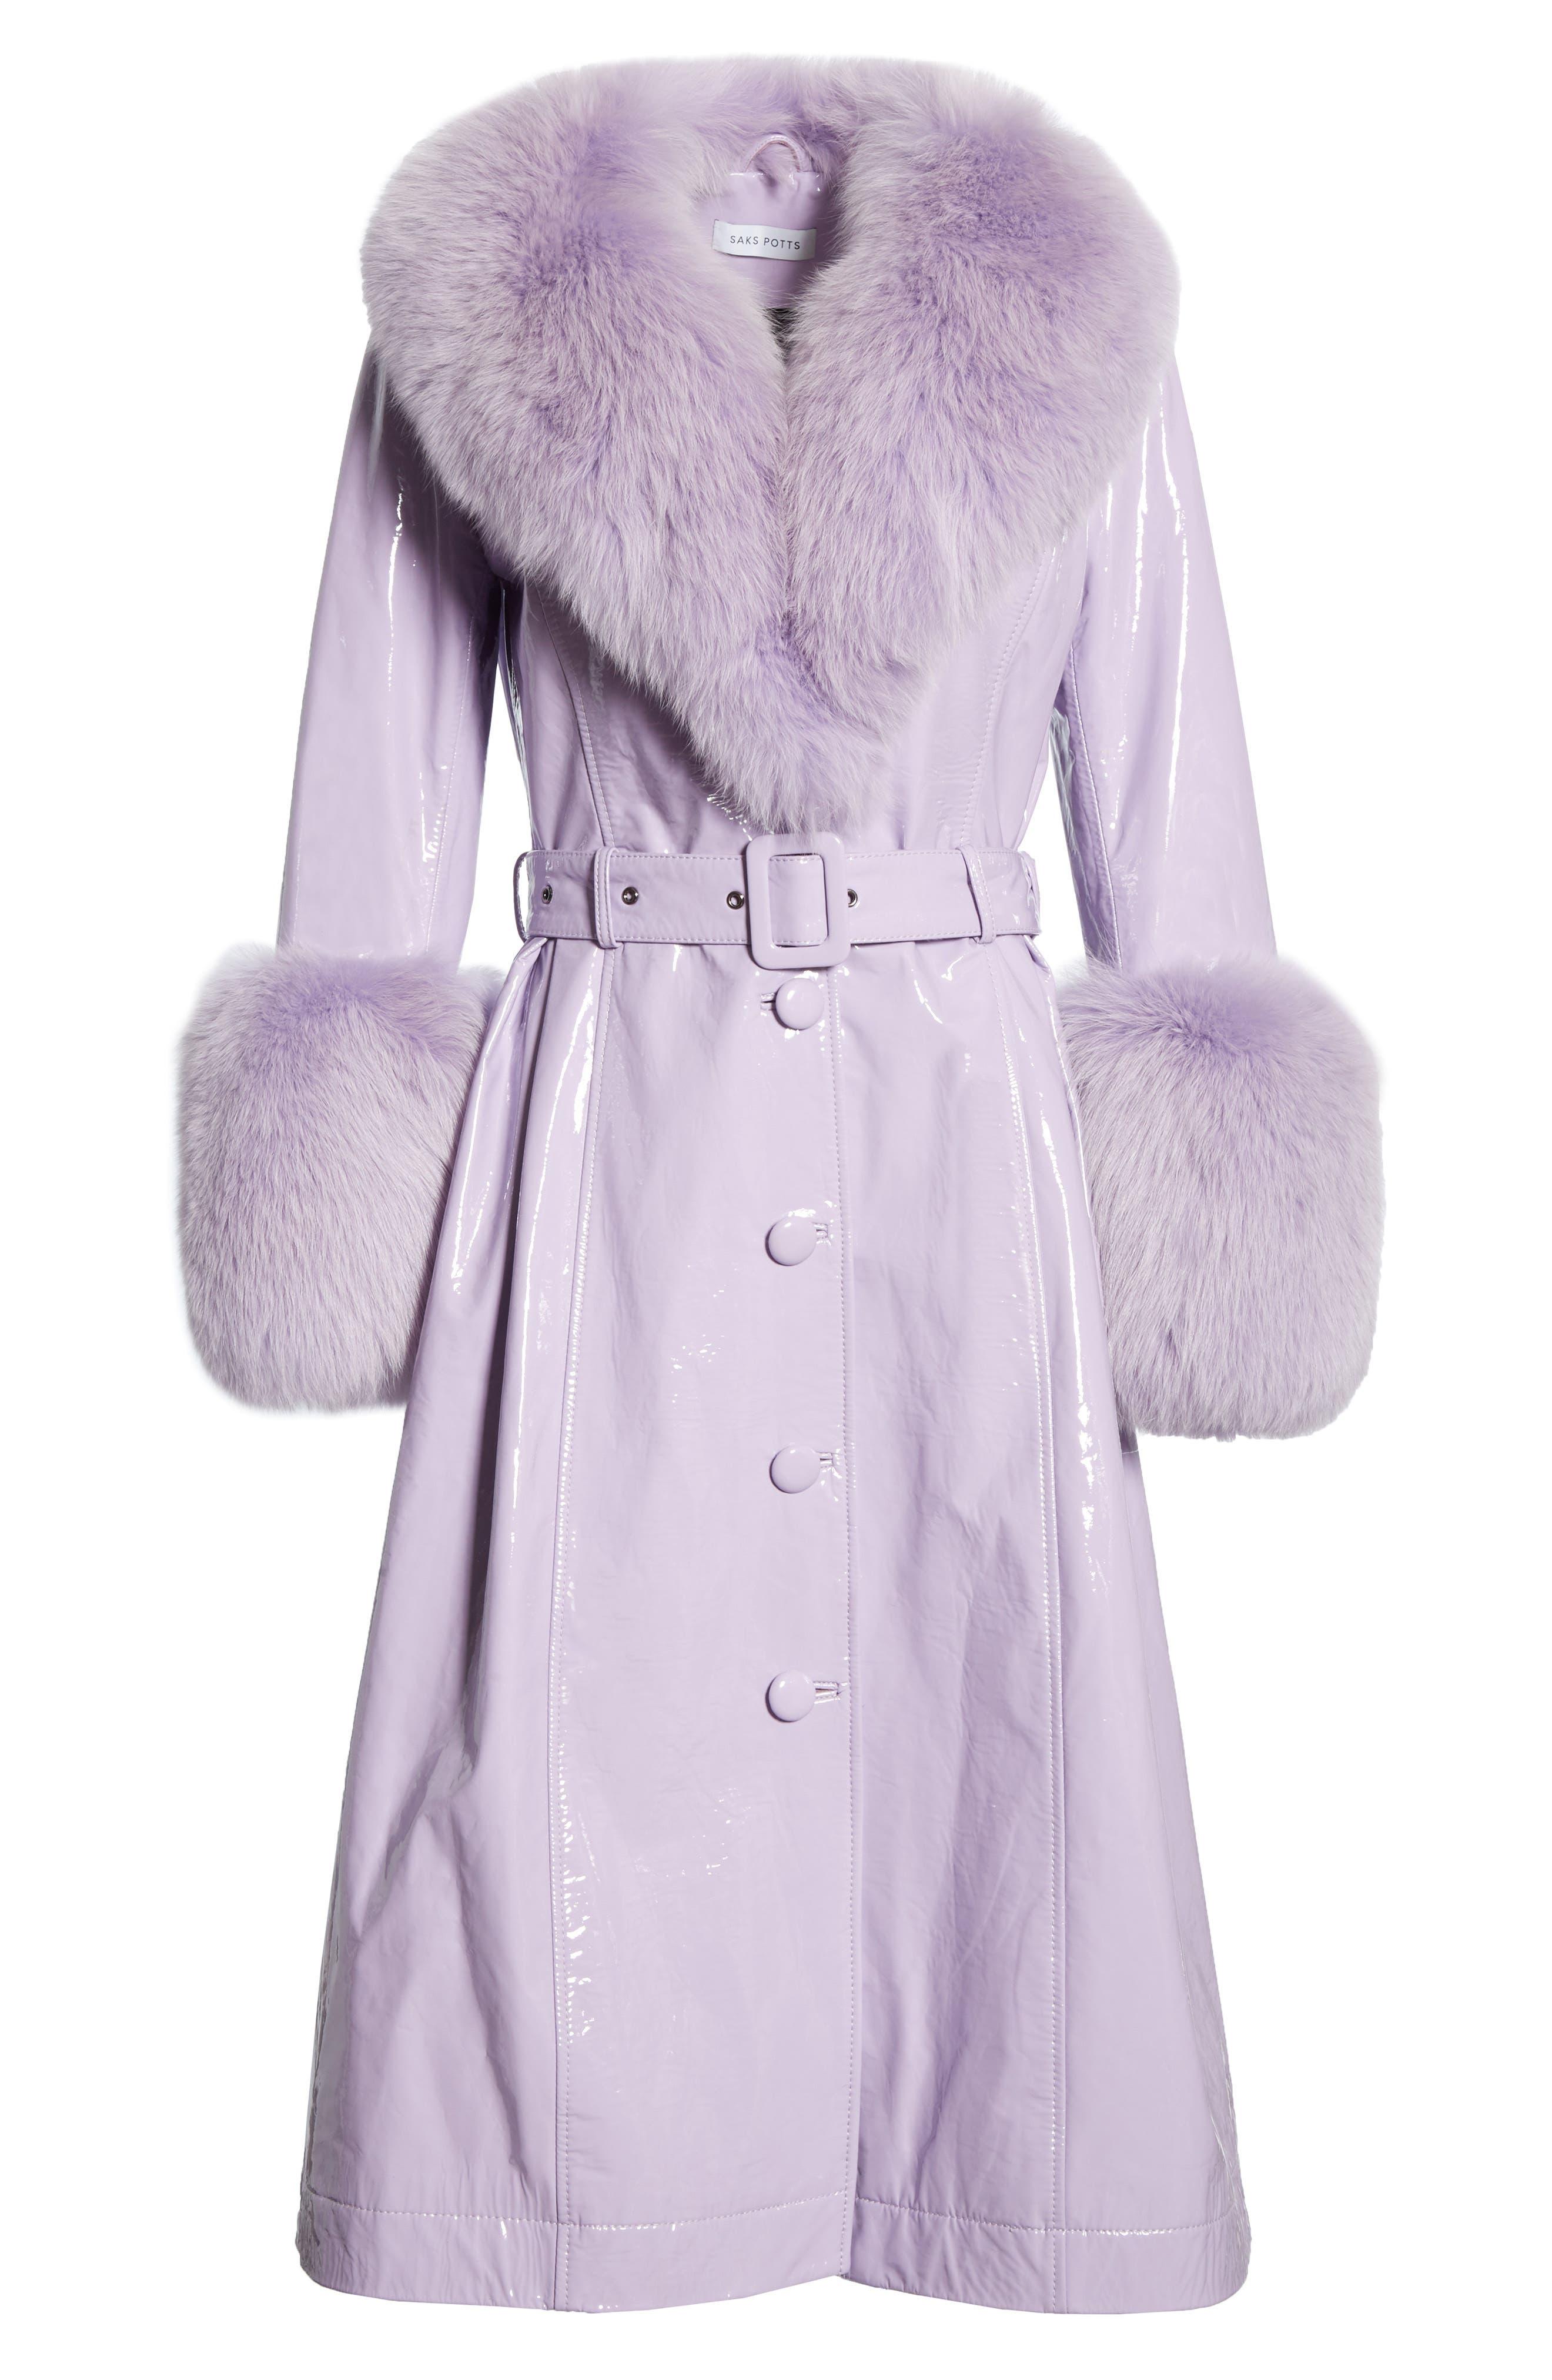 Patent Leather Coat with Genuine Fox Fur Trim,                             Alternate thumbnail 5, color,                             LAVENDER